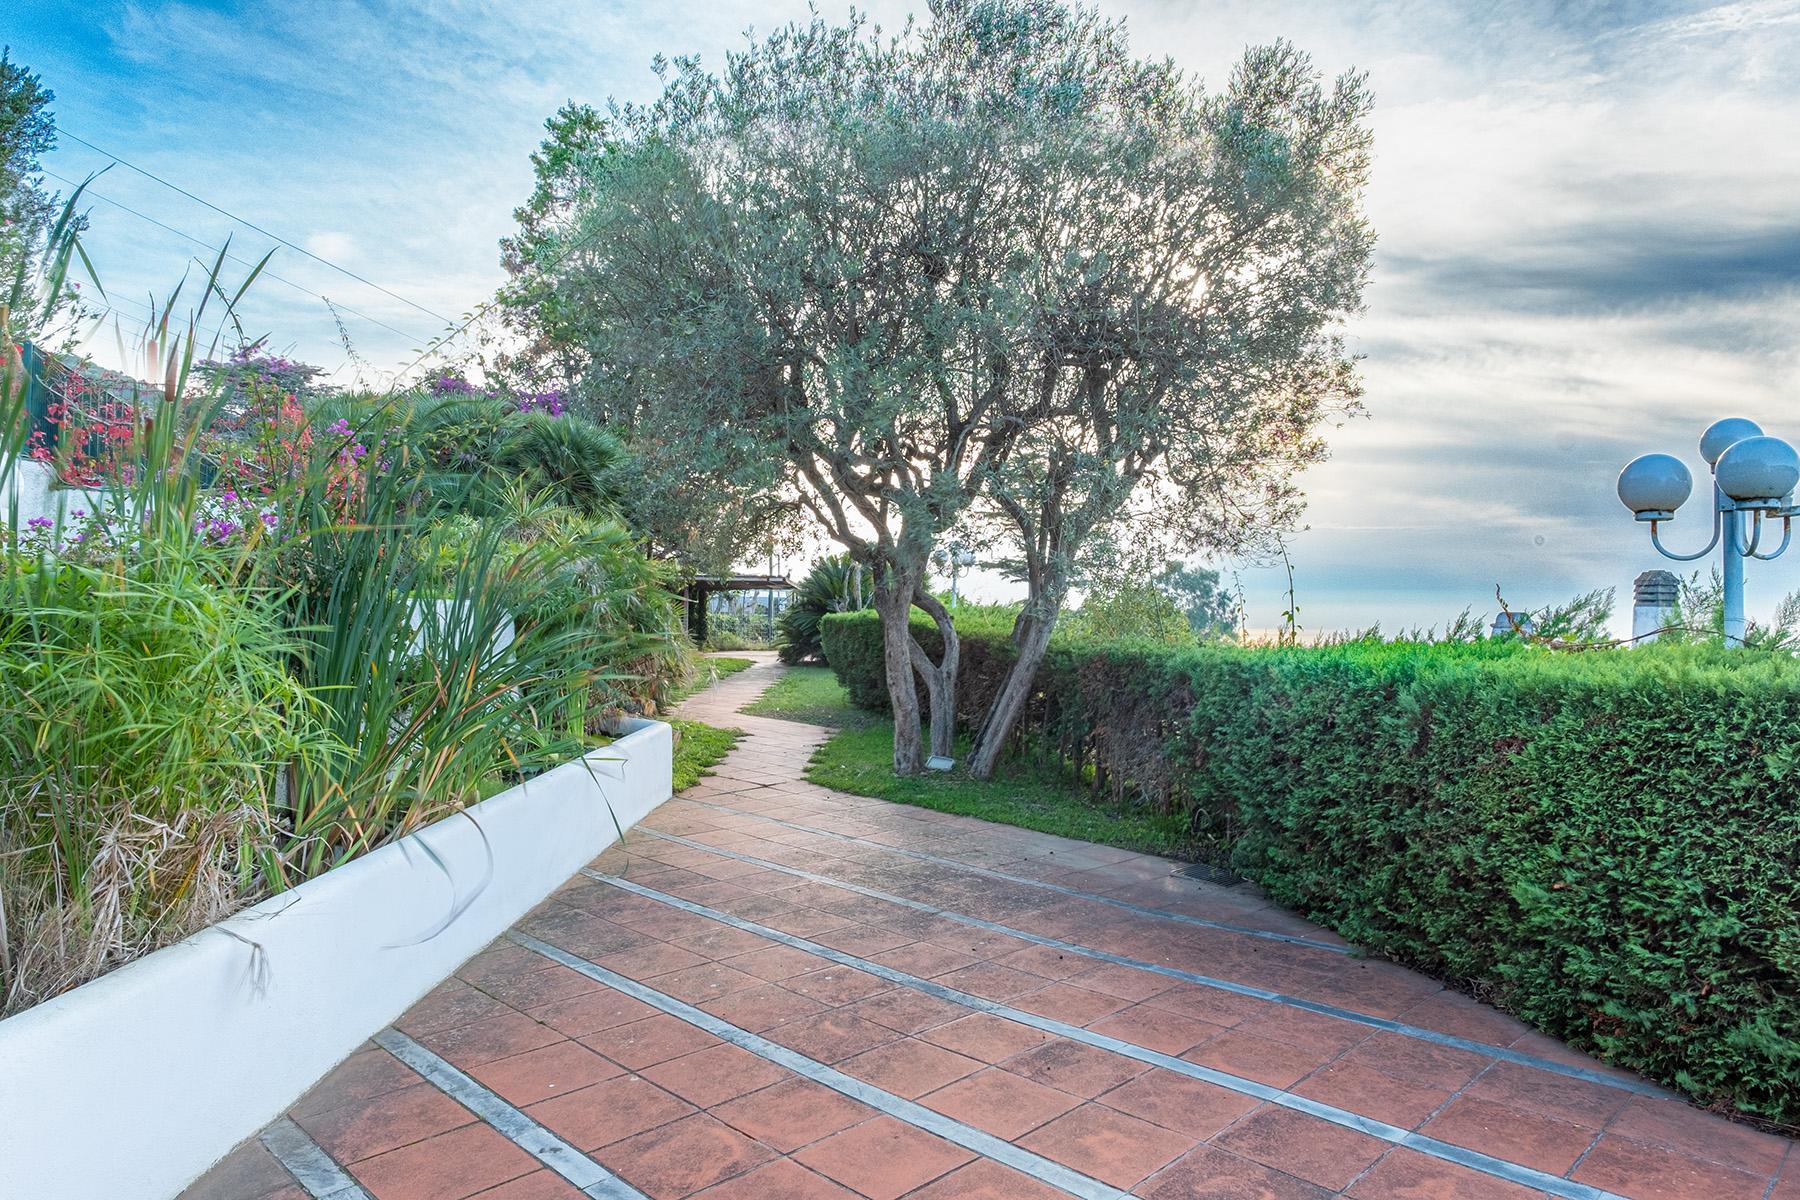 Panoramic villa with swimming pool in Anacapri city center - 13